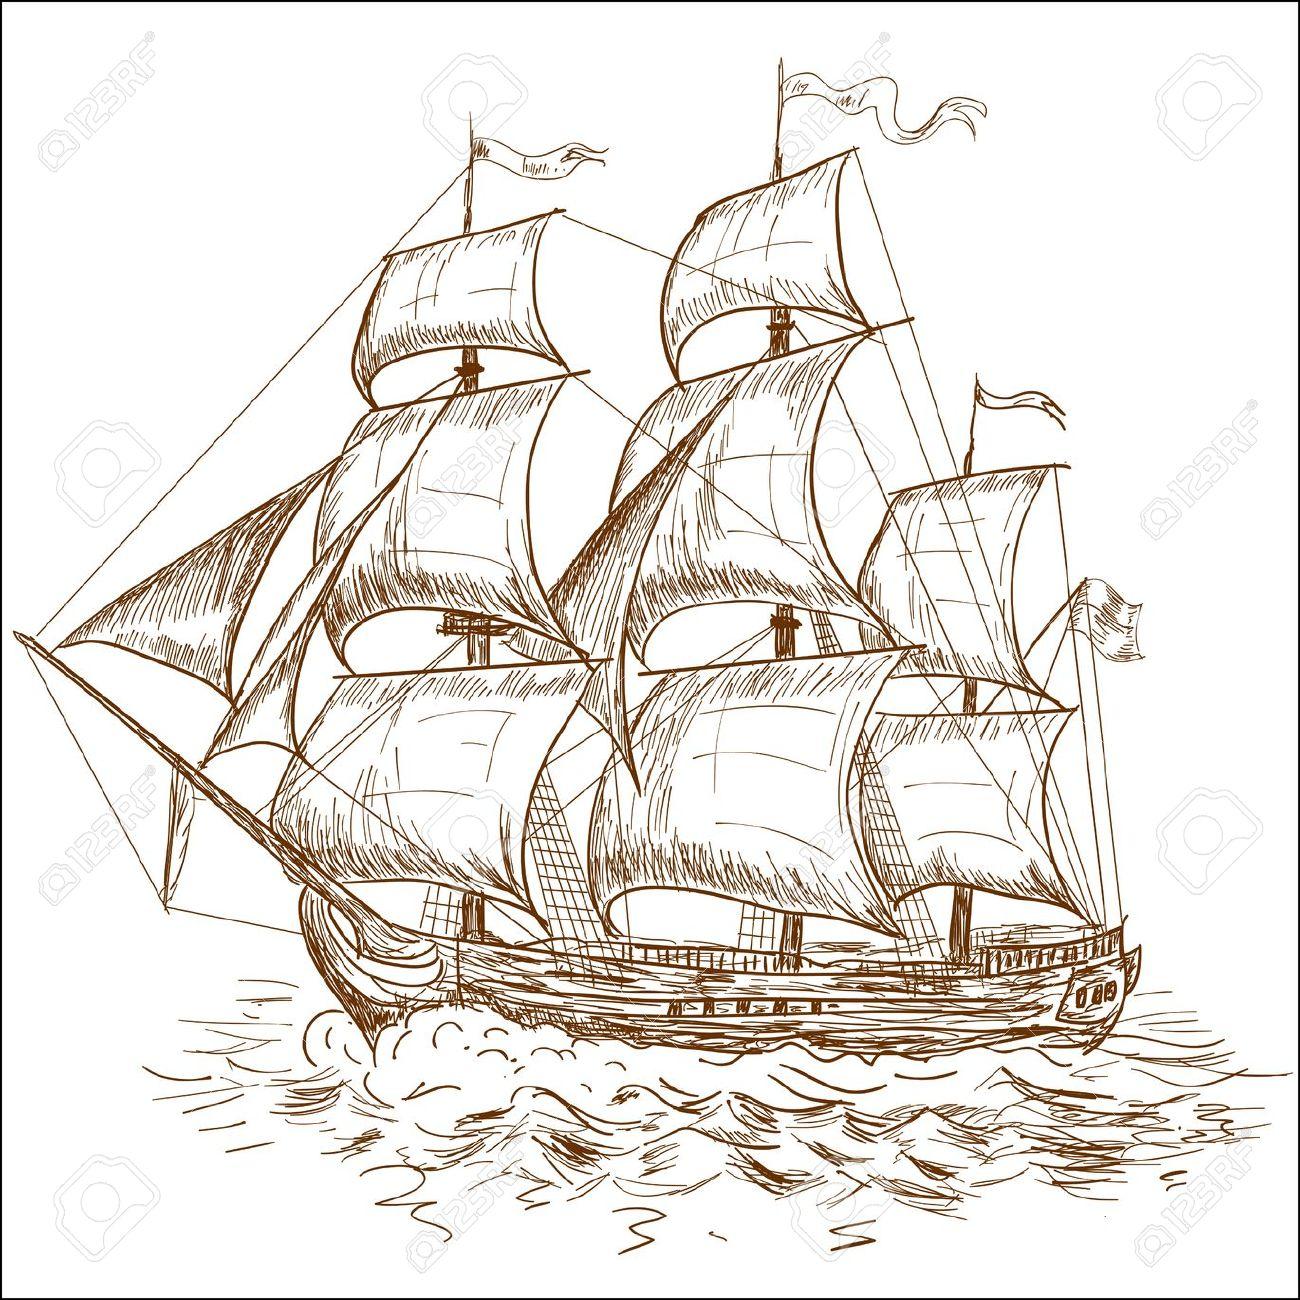 Old Sailing Ships clipart vintage Sailing Old  ships Pinterest